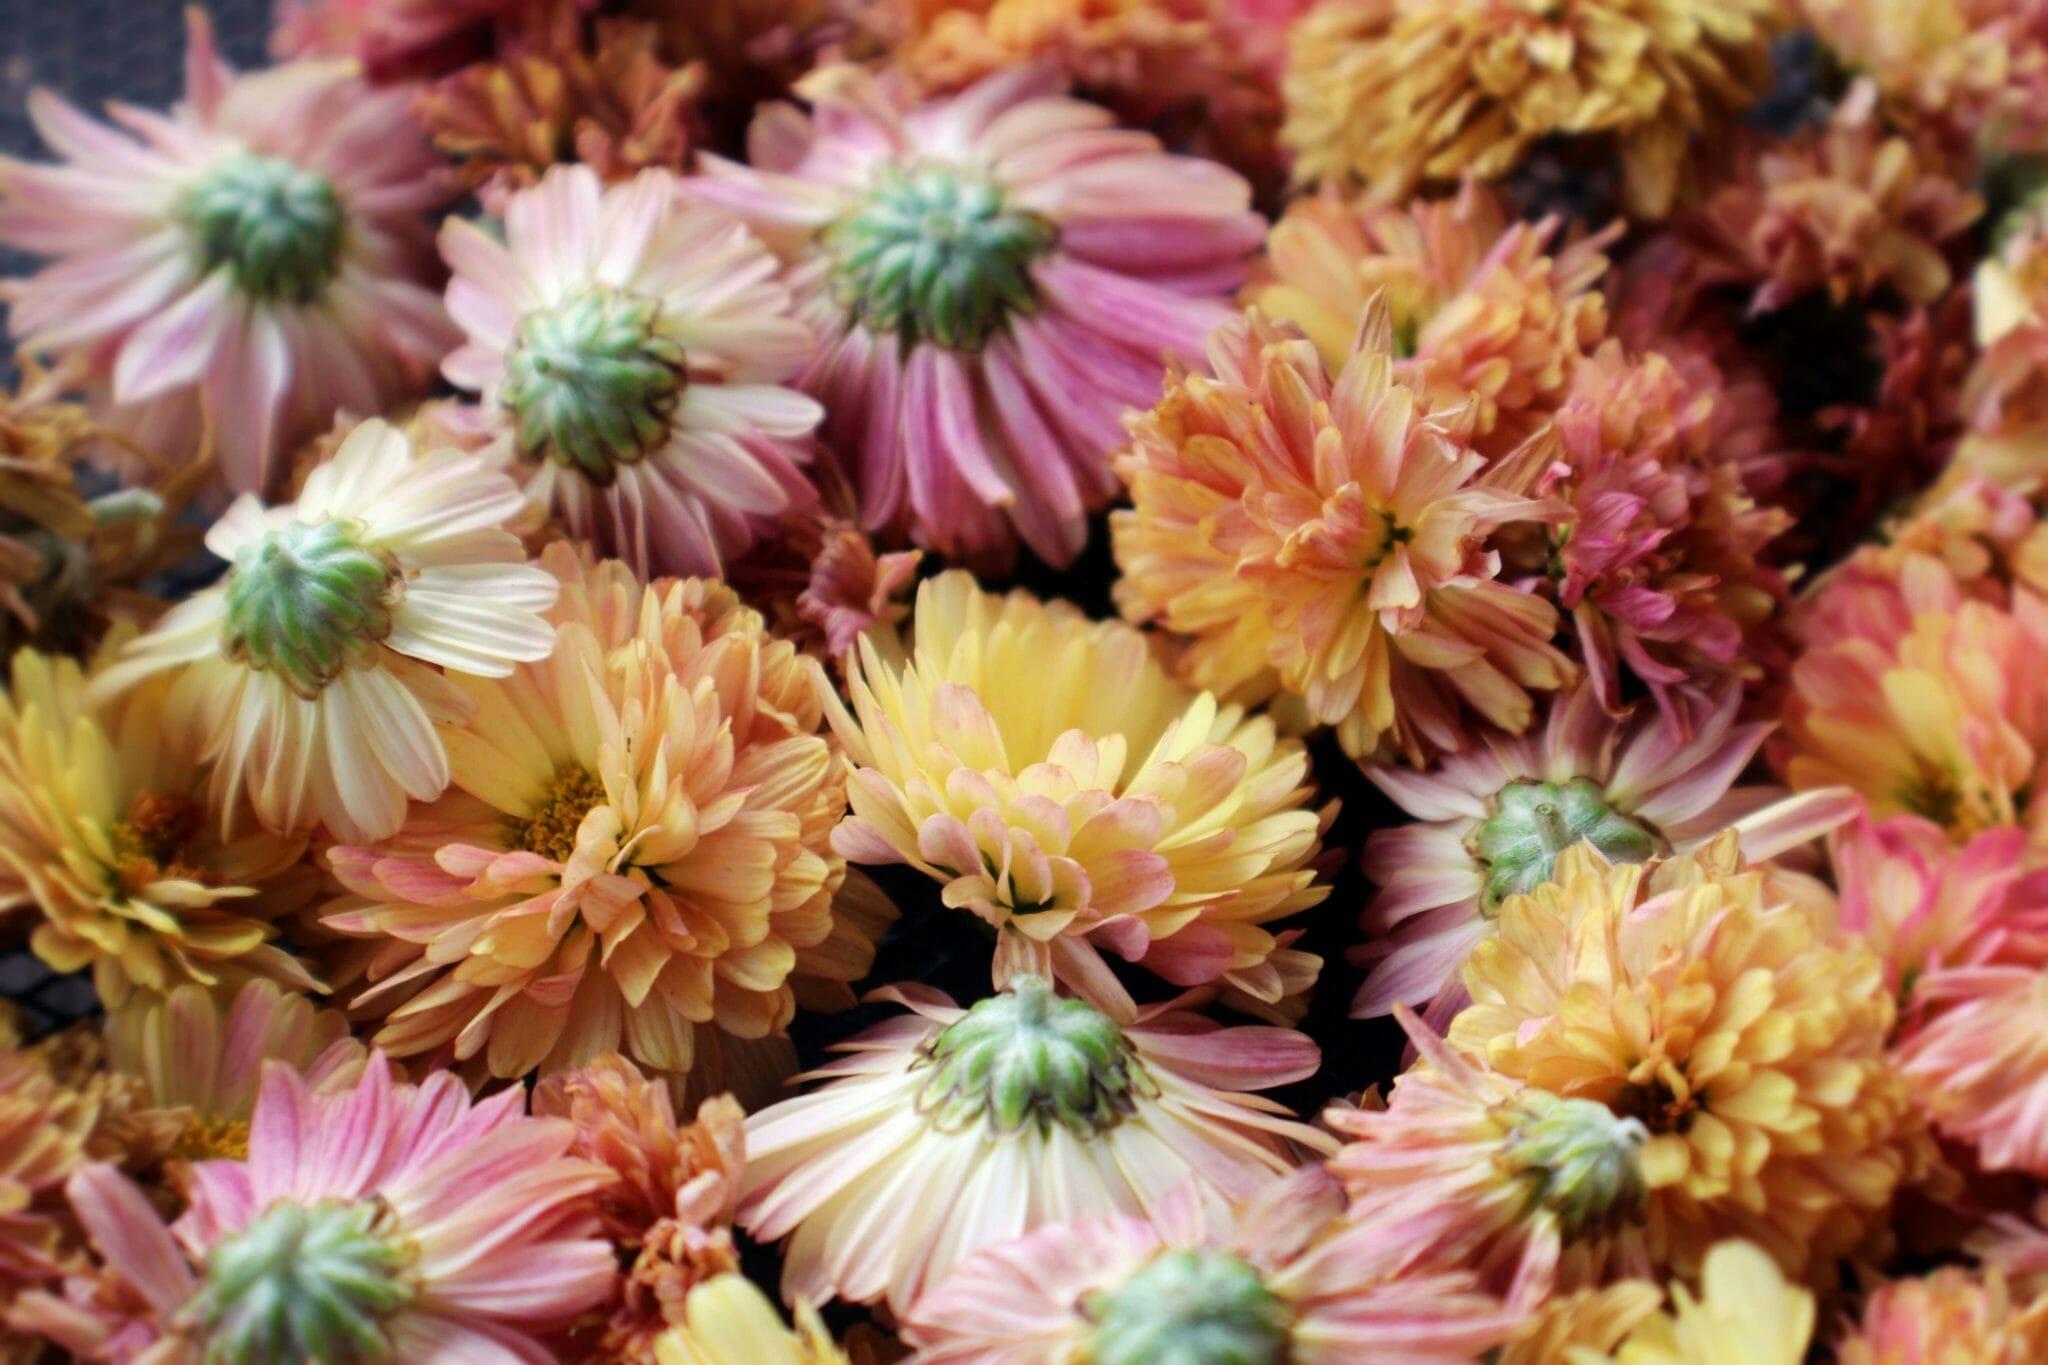 Chrysanthemums Official Birth Flower for November